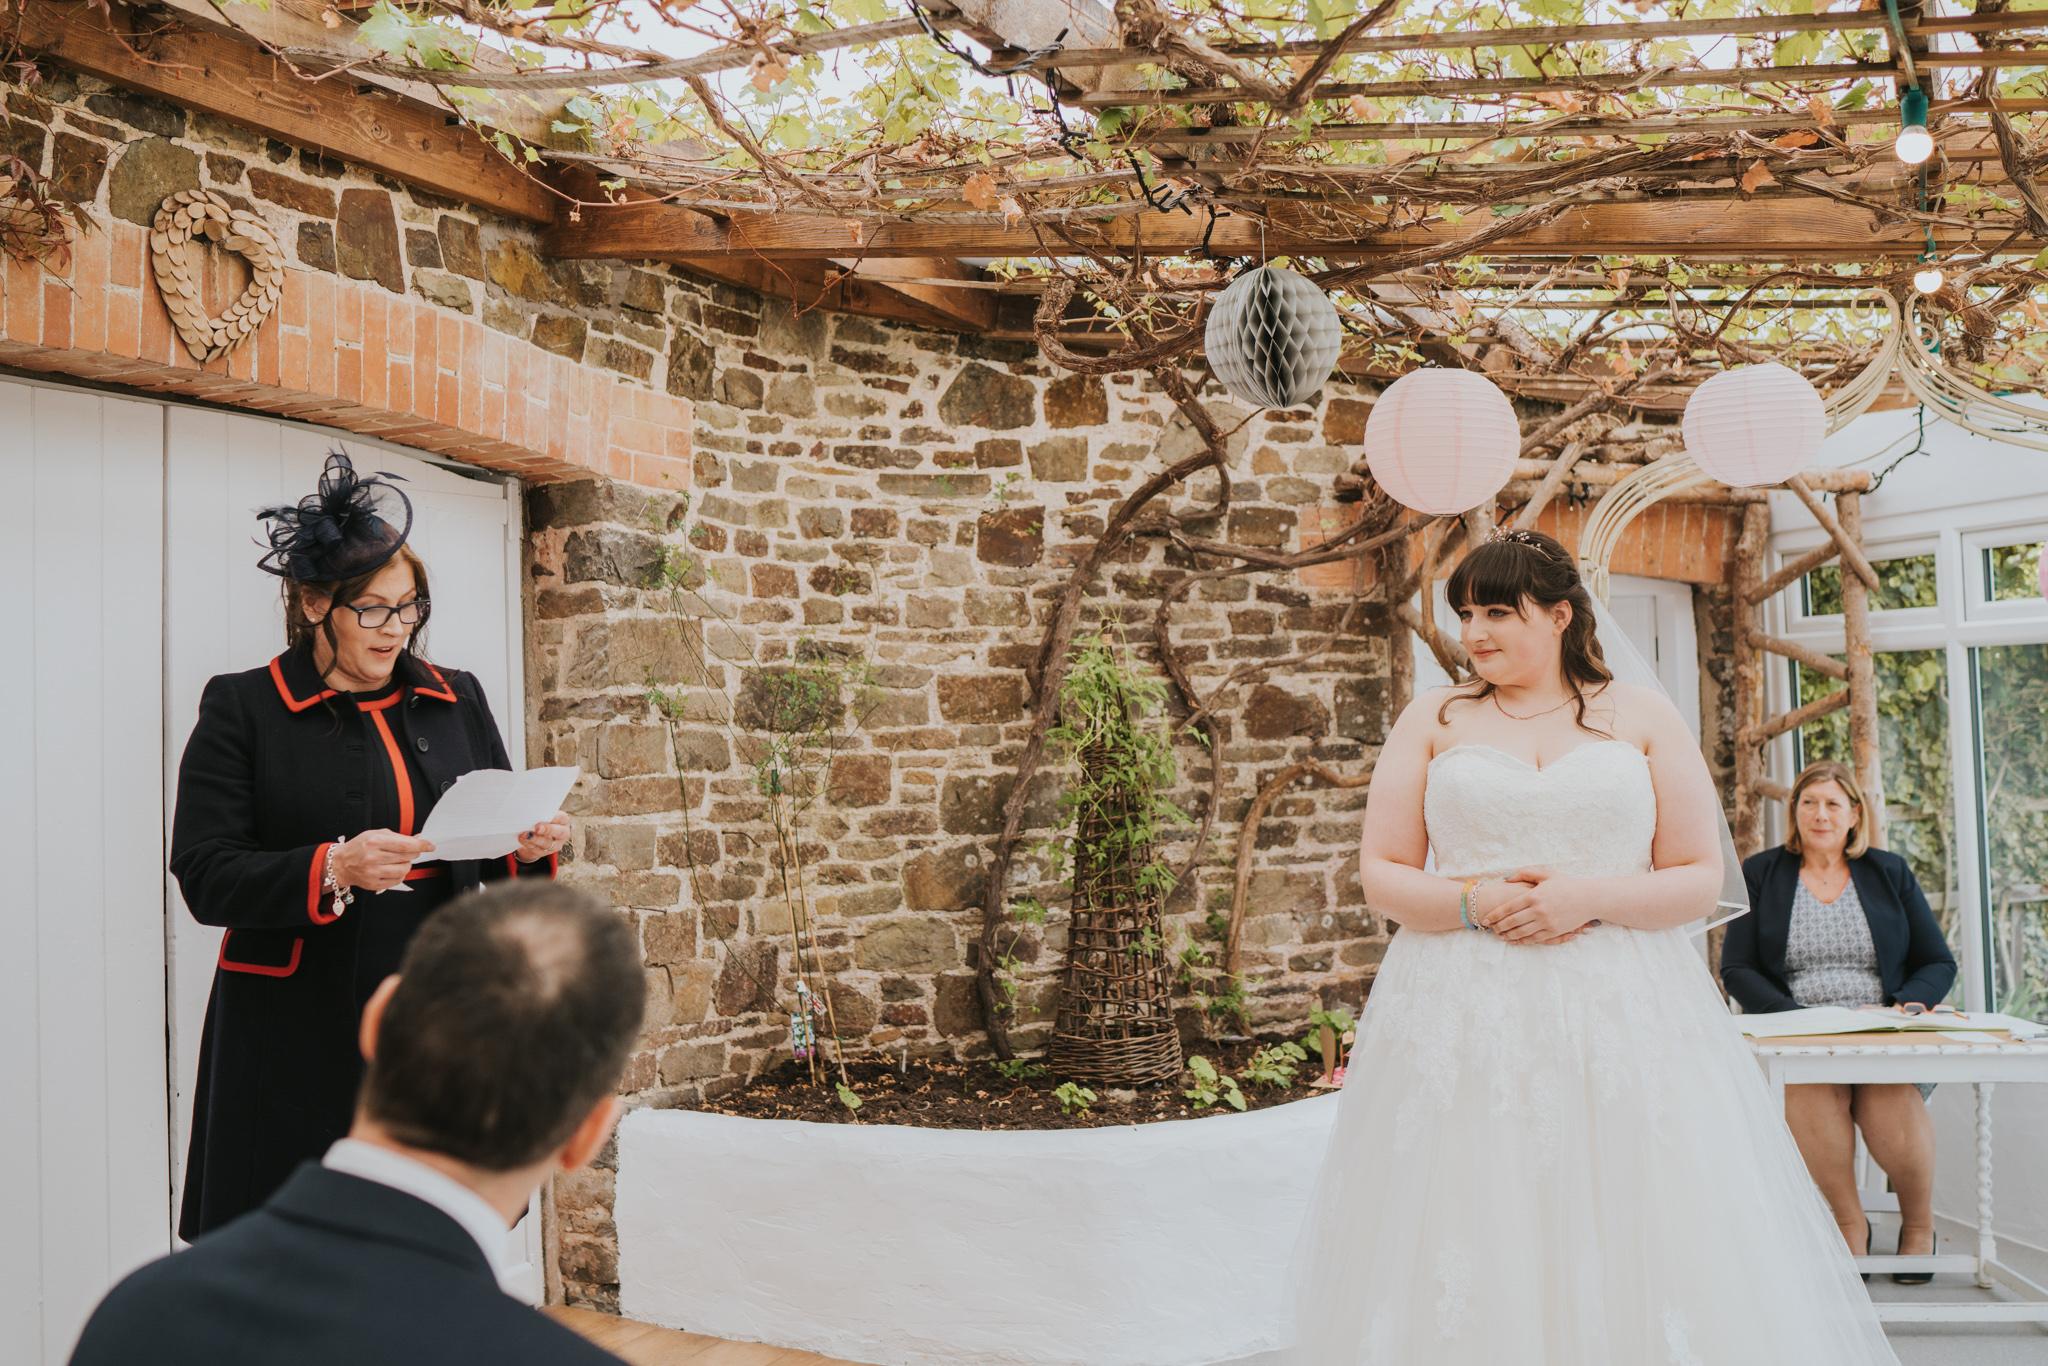 grace-sam-old-barn-clovelly-devon-wedding-photographer-grace-elizabeth-essex-suffolk-norfolk-wedding-photographer (50 of 132).jpg